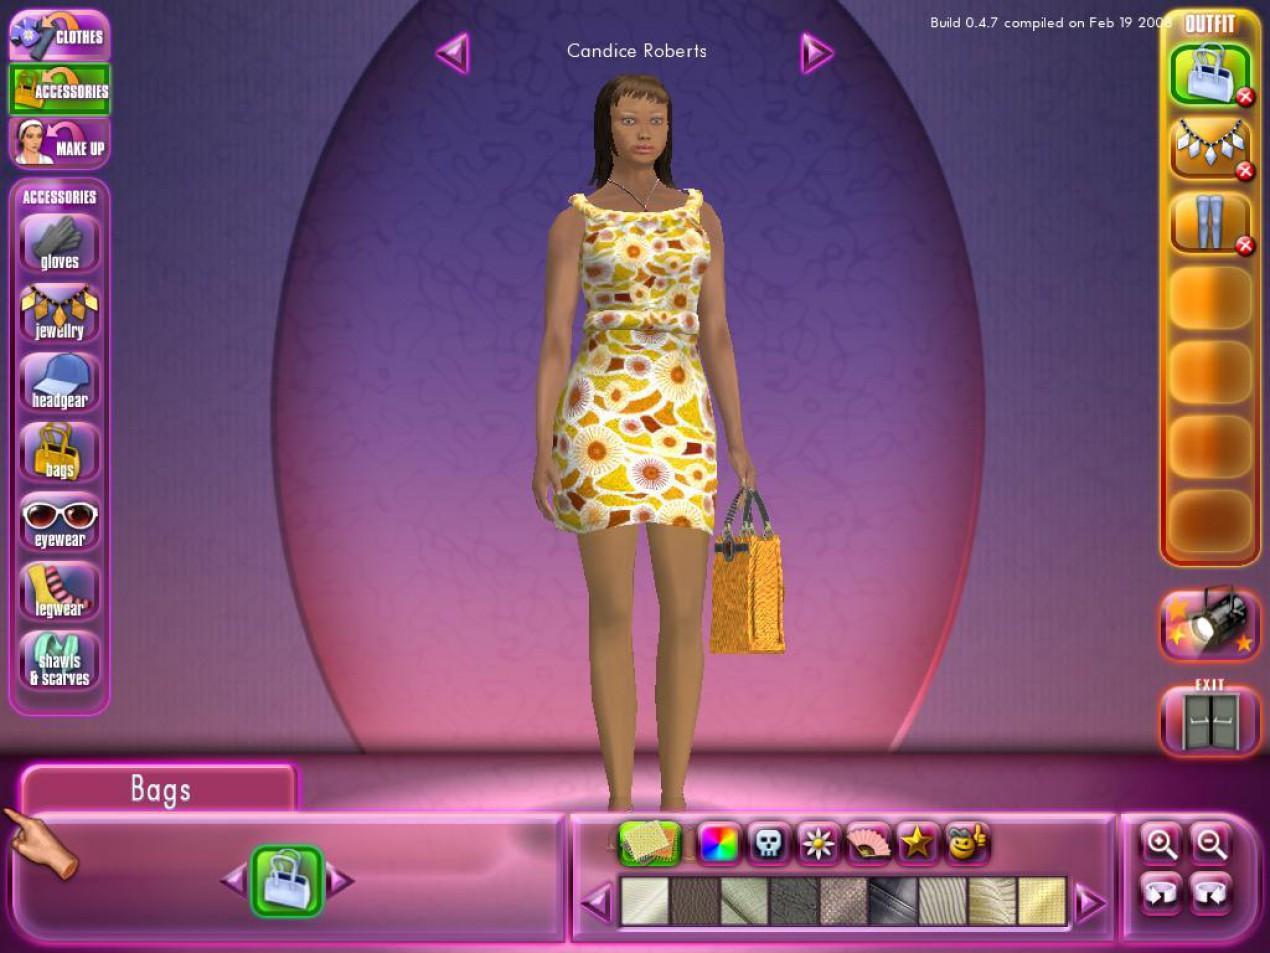 Virtual Worlds for Girls Girls Virtual Fashion World - Fashion Games Free fashion virtual world games